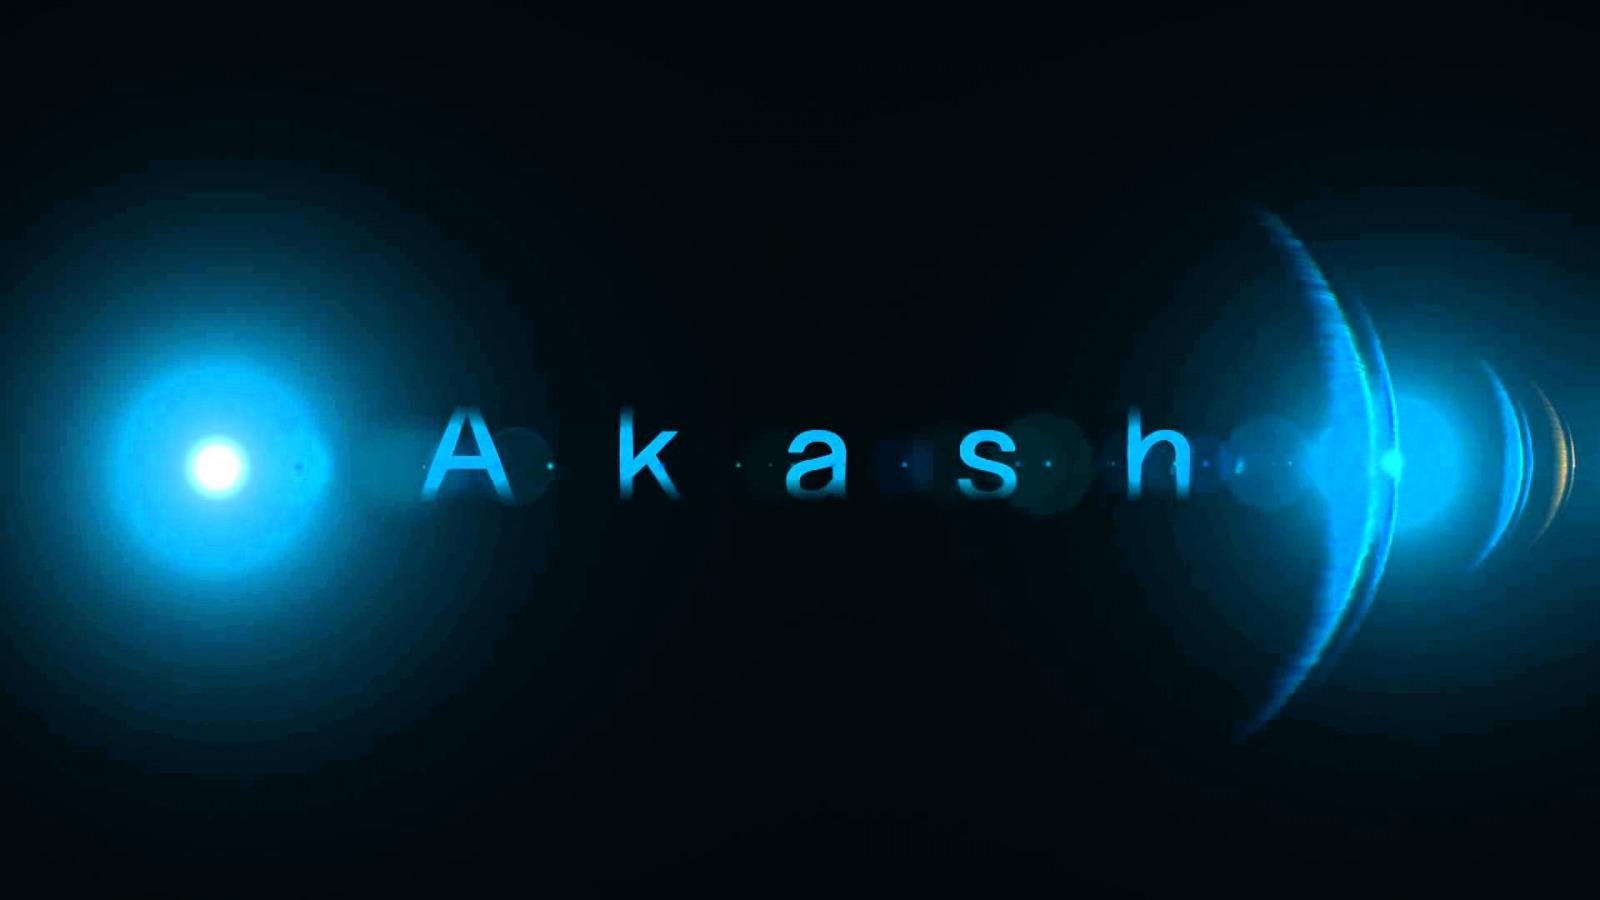 Google homepage themes your name - Custom Homepage Themes Backgrounds Like Google Skins Akash Devries